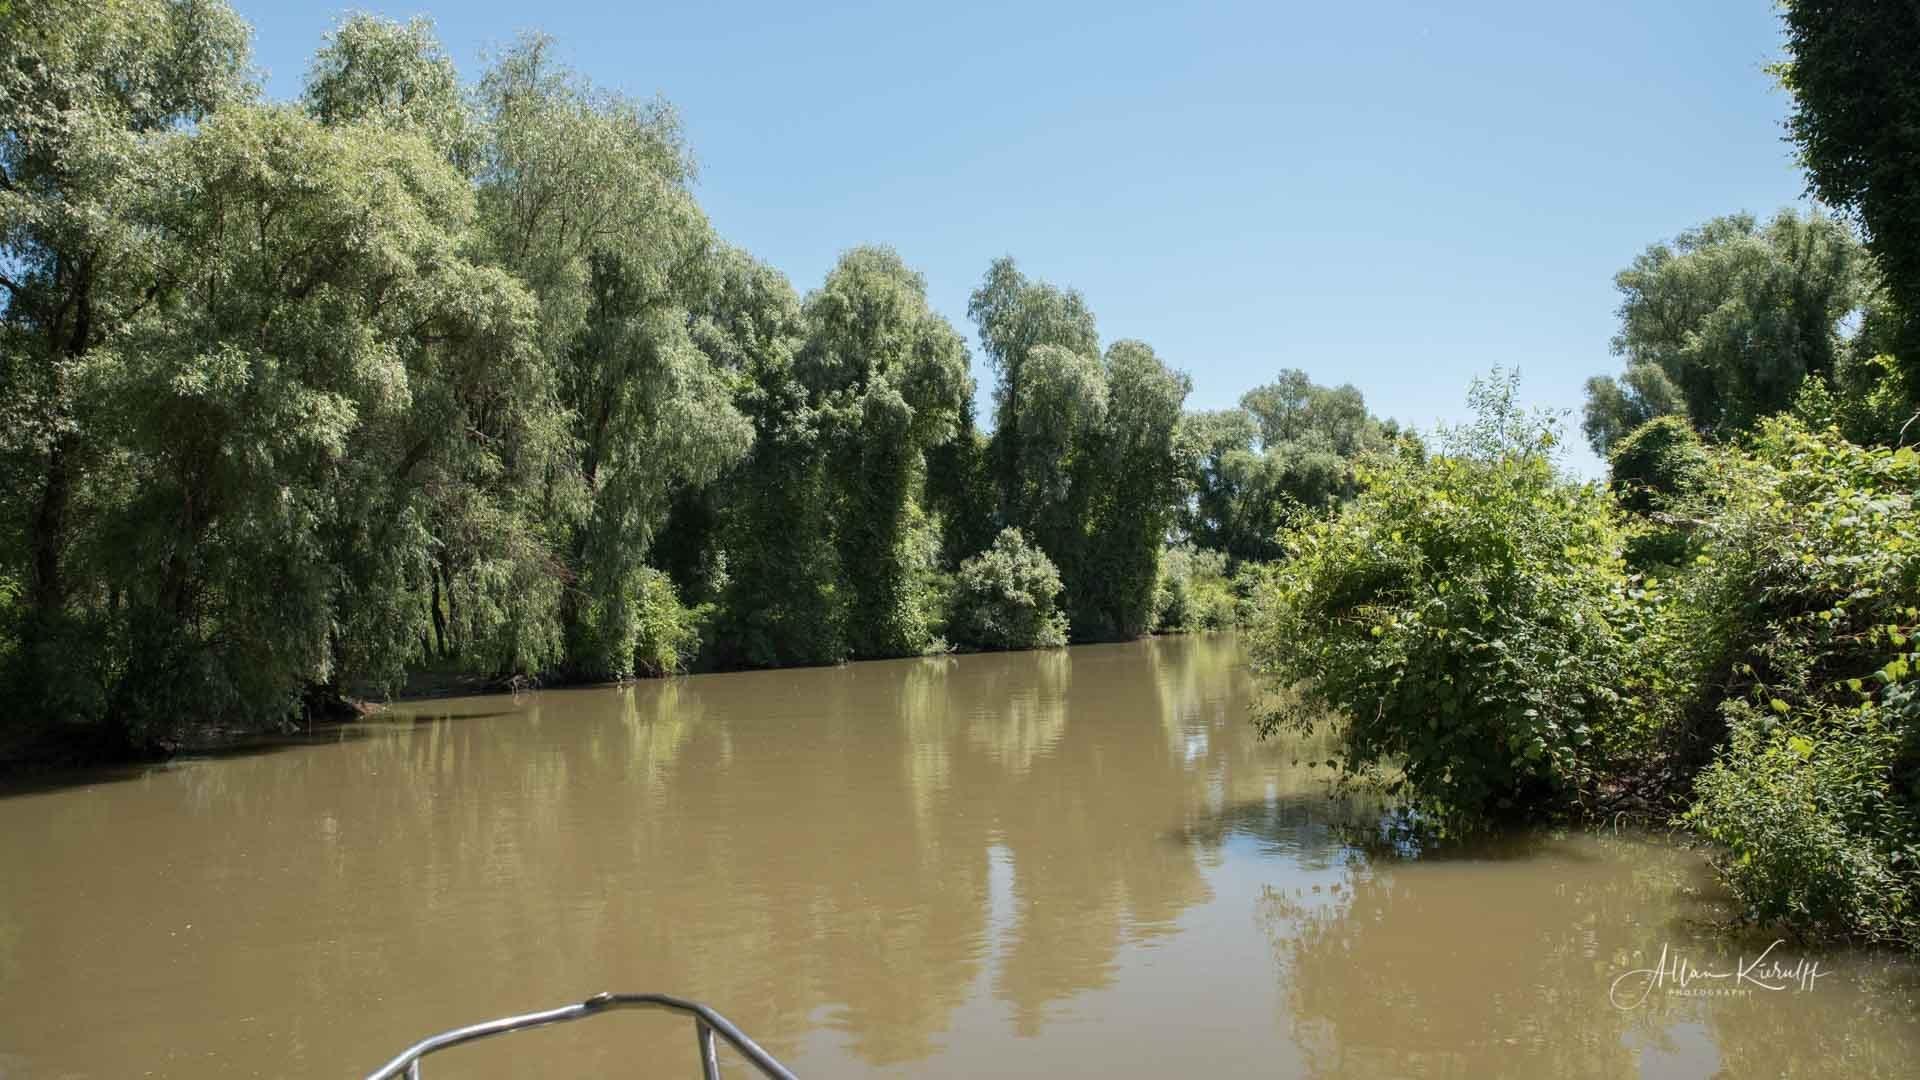 Donau Deltaet